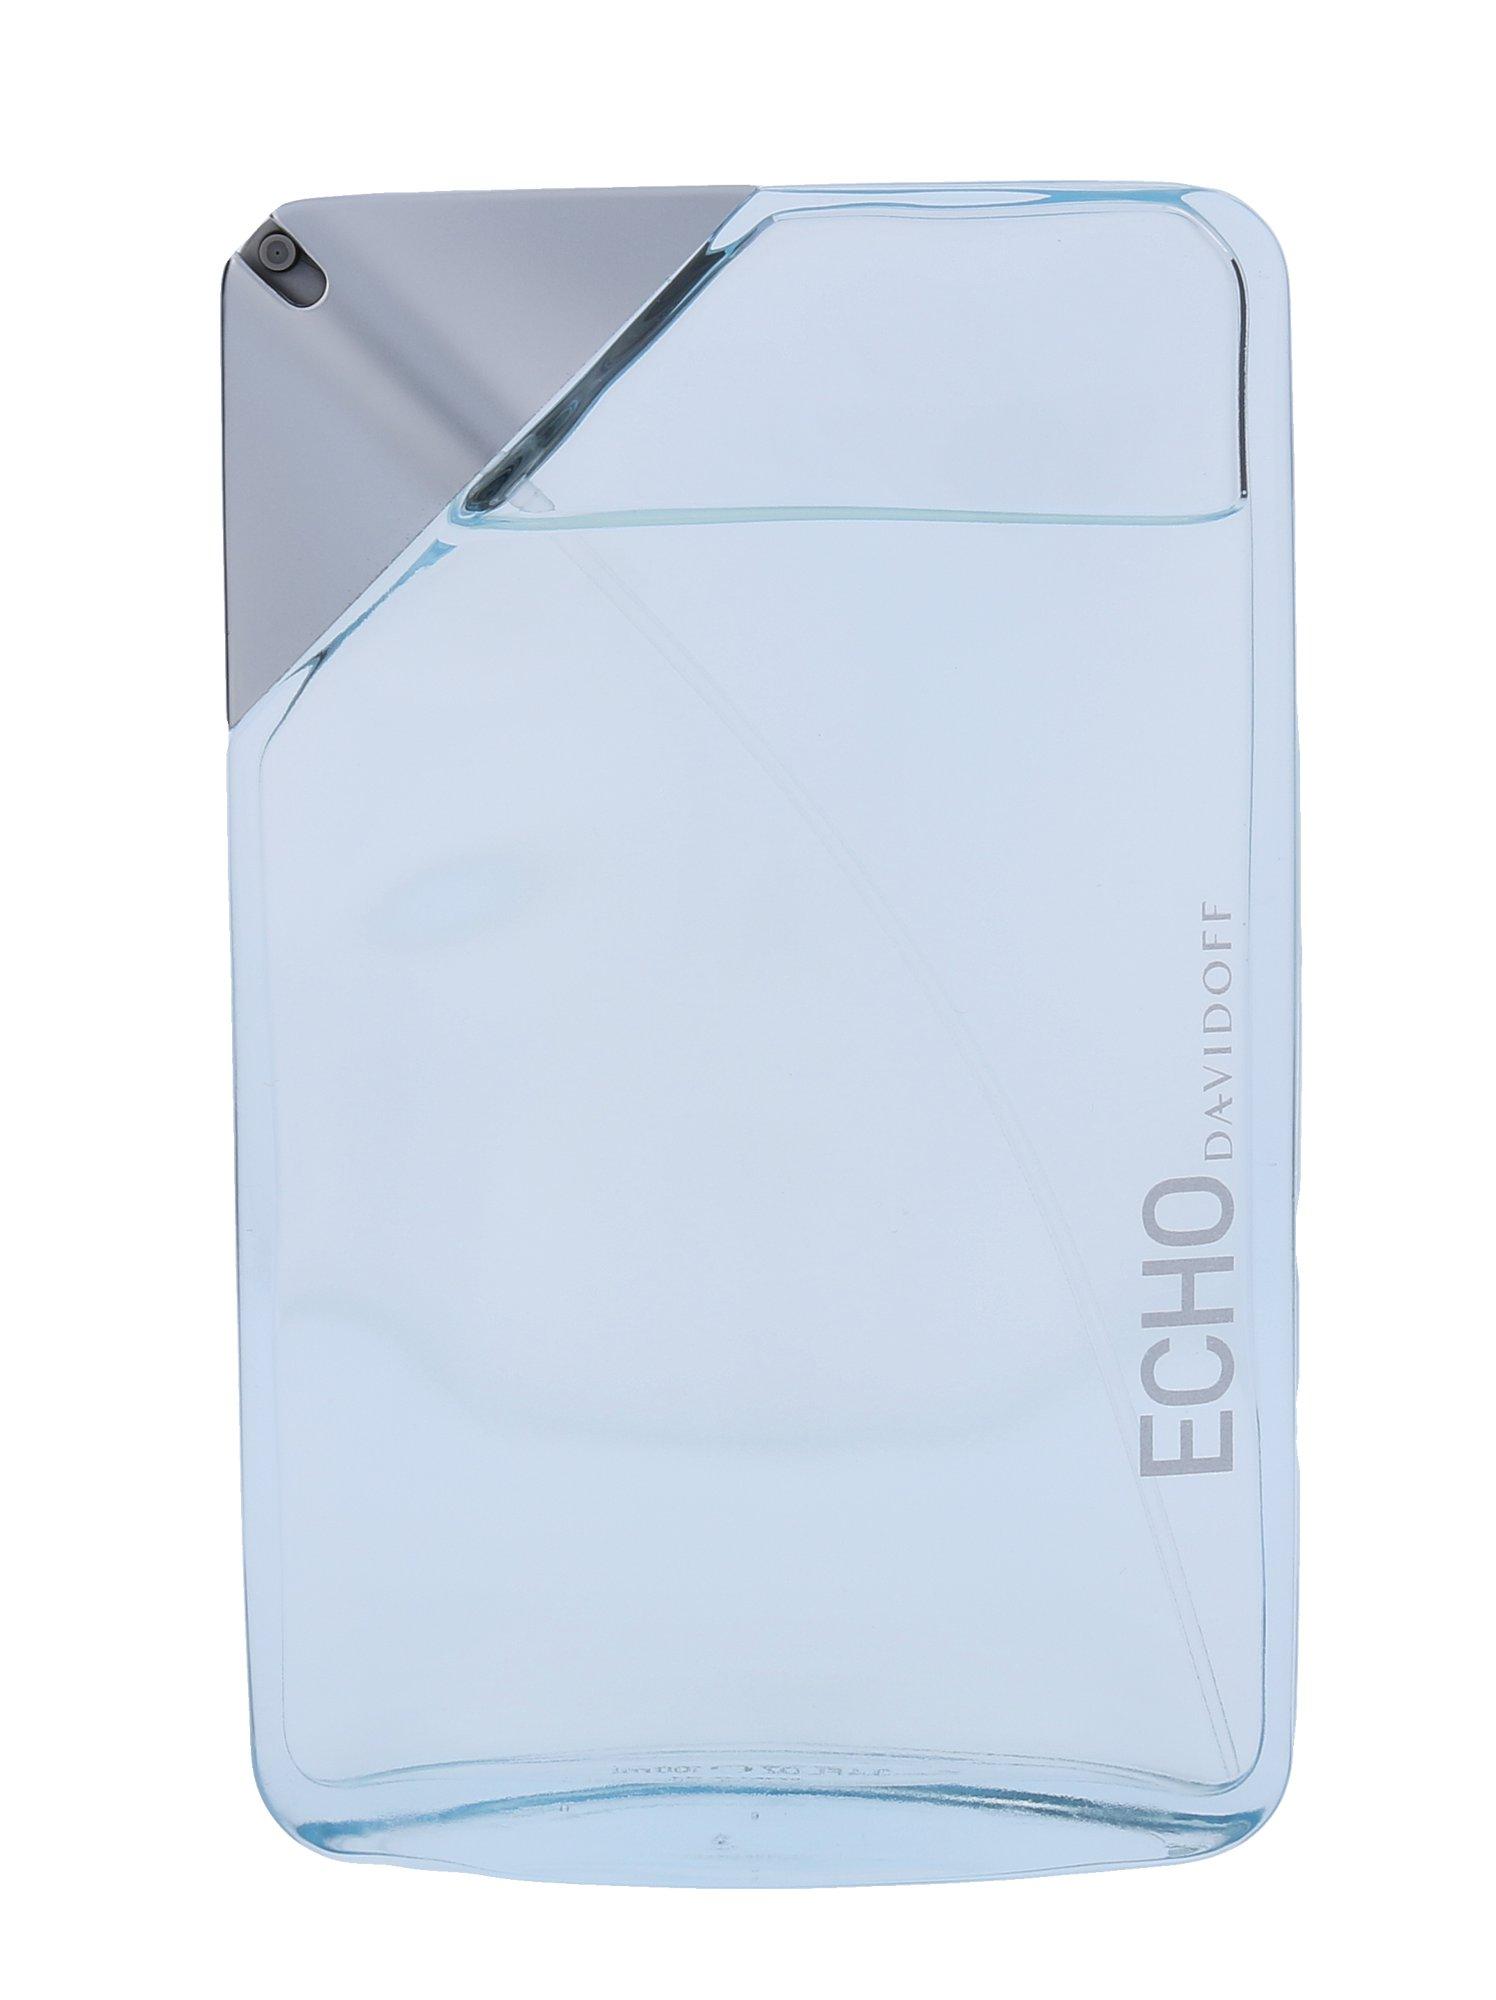 Davidoff Echo, Toaletná voda 100ml